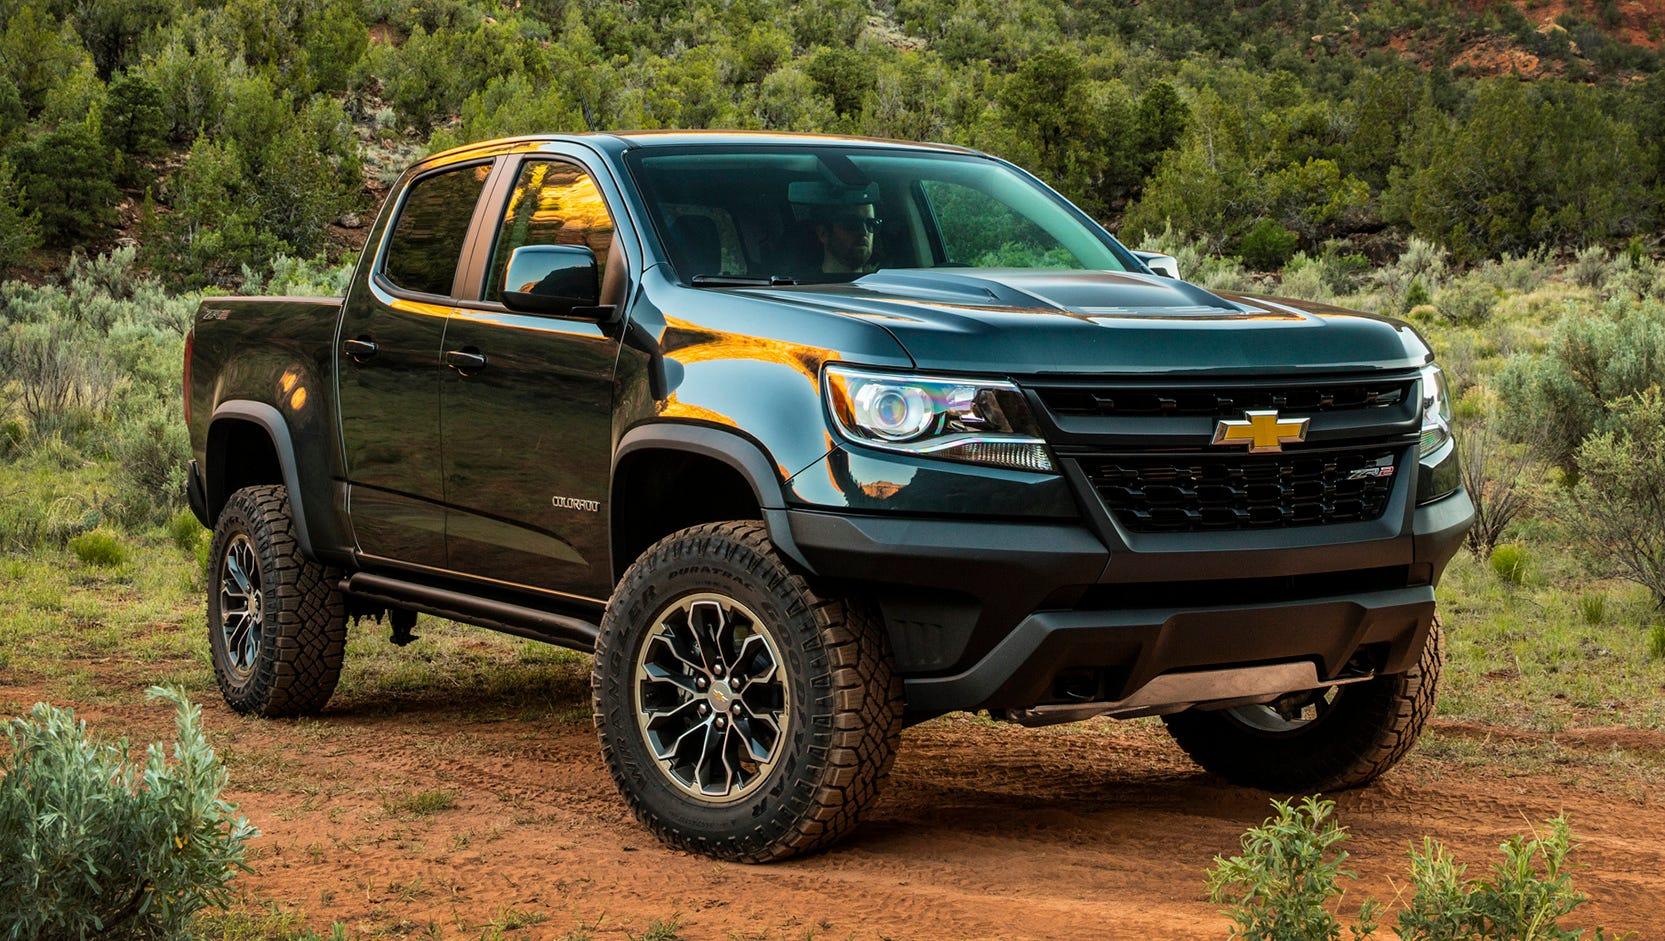 2018 Trucks Worth Waiting For >> Edmunds Compares 5 Midsize Pickup Trucks